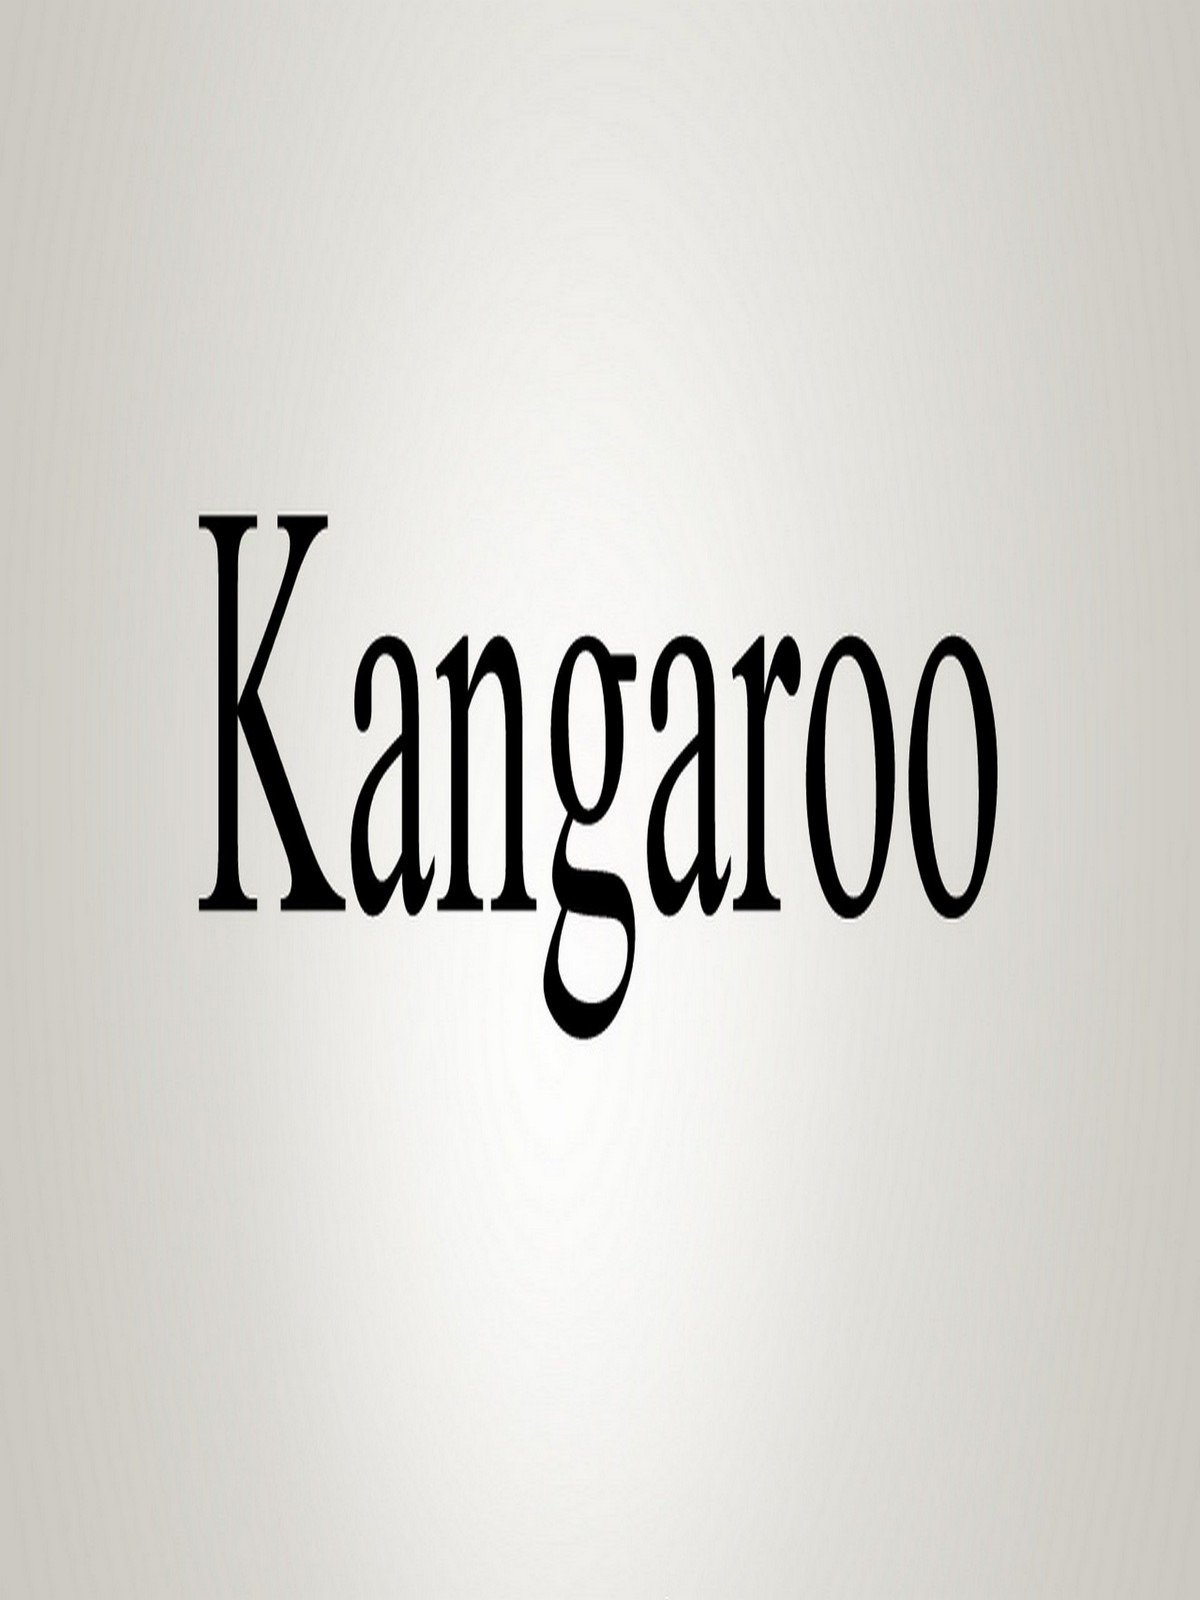 Watch How To Pronounce Kangaroo  Prime Video